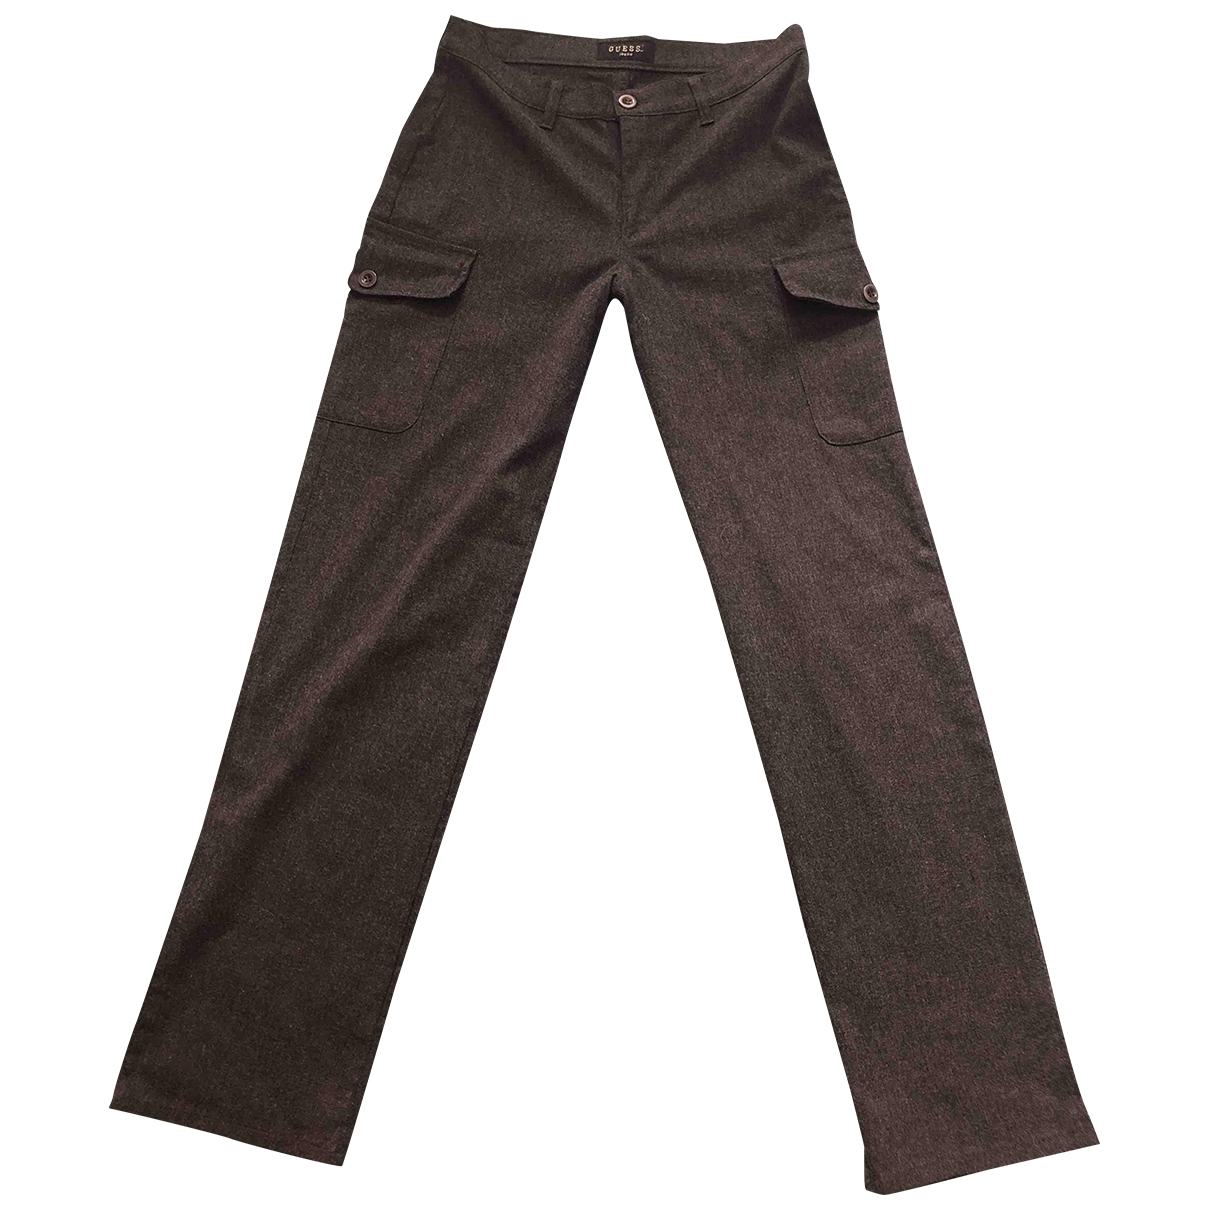 Guess \N Grey Trousers for Men M International